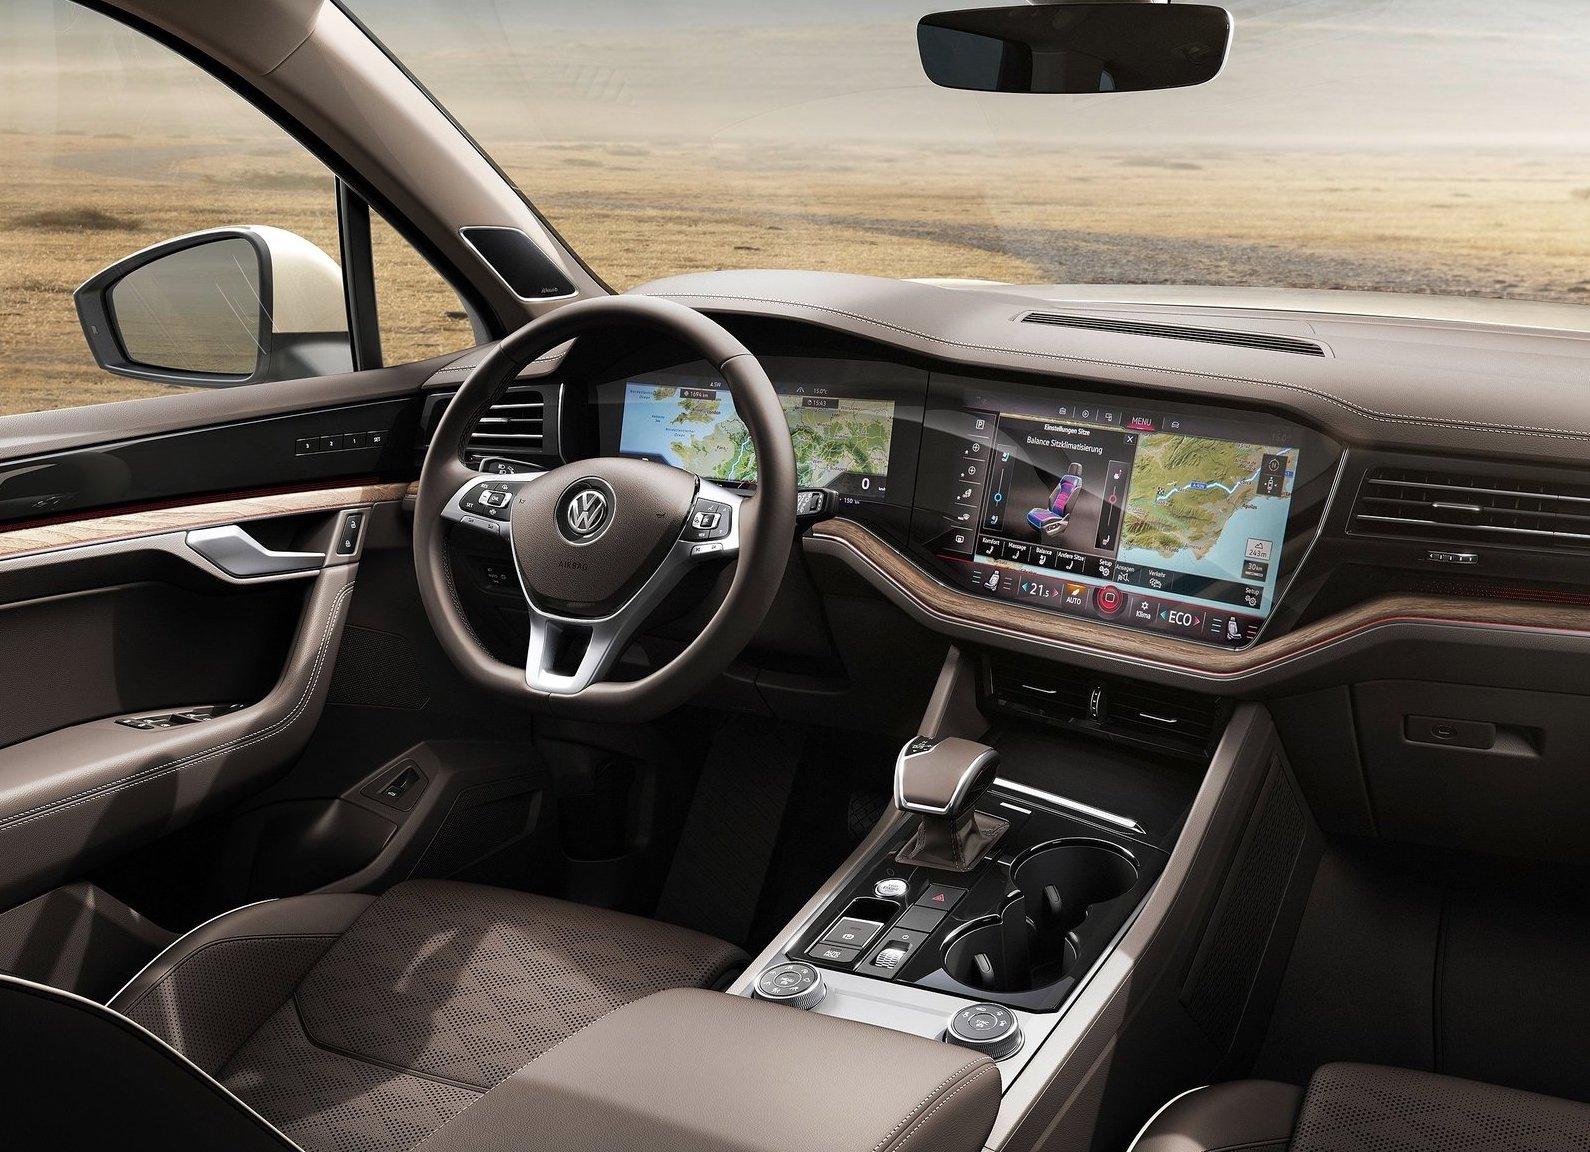 2019 Volkswagen Touareg unveiled, gets 310kW V8 diesel | PerformanceDrive